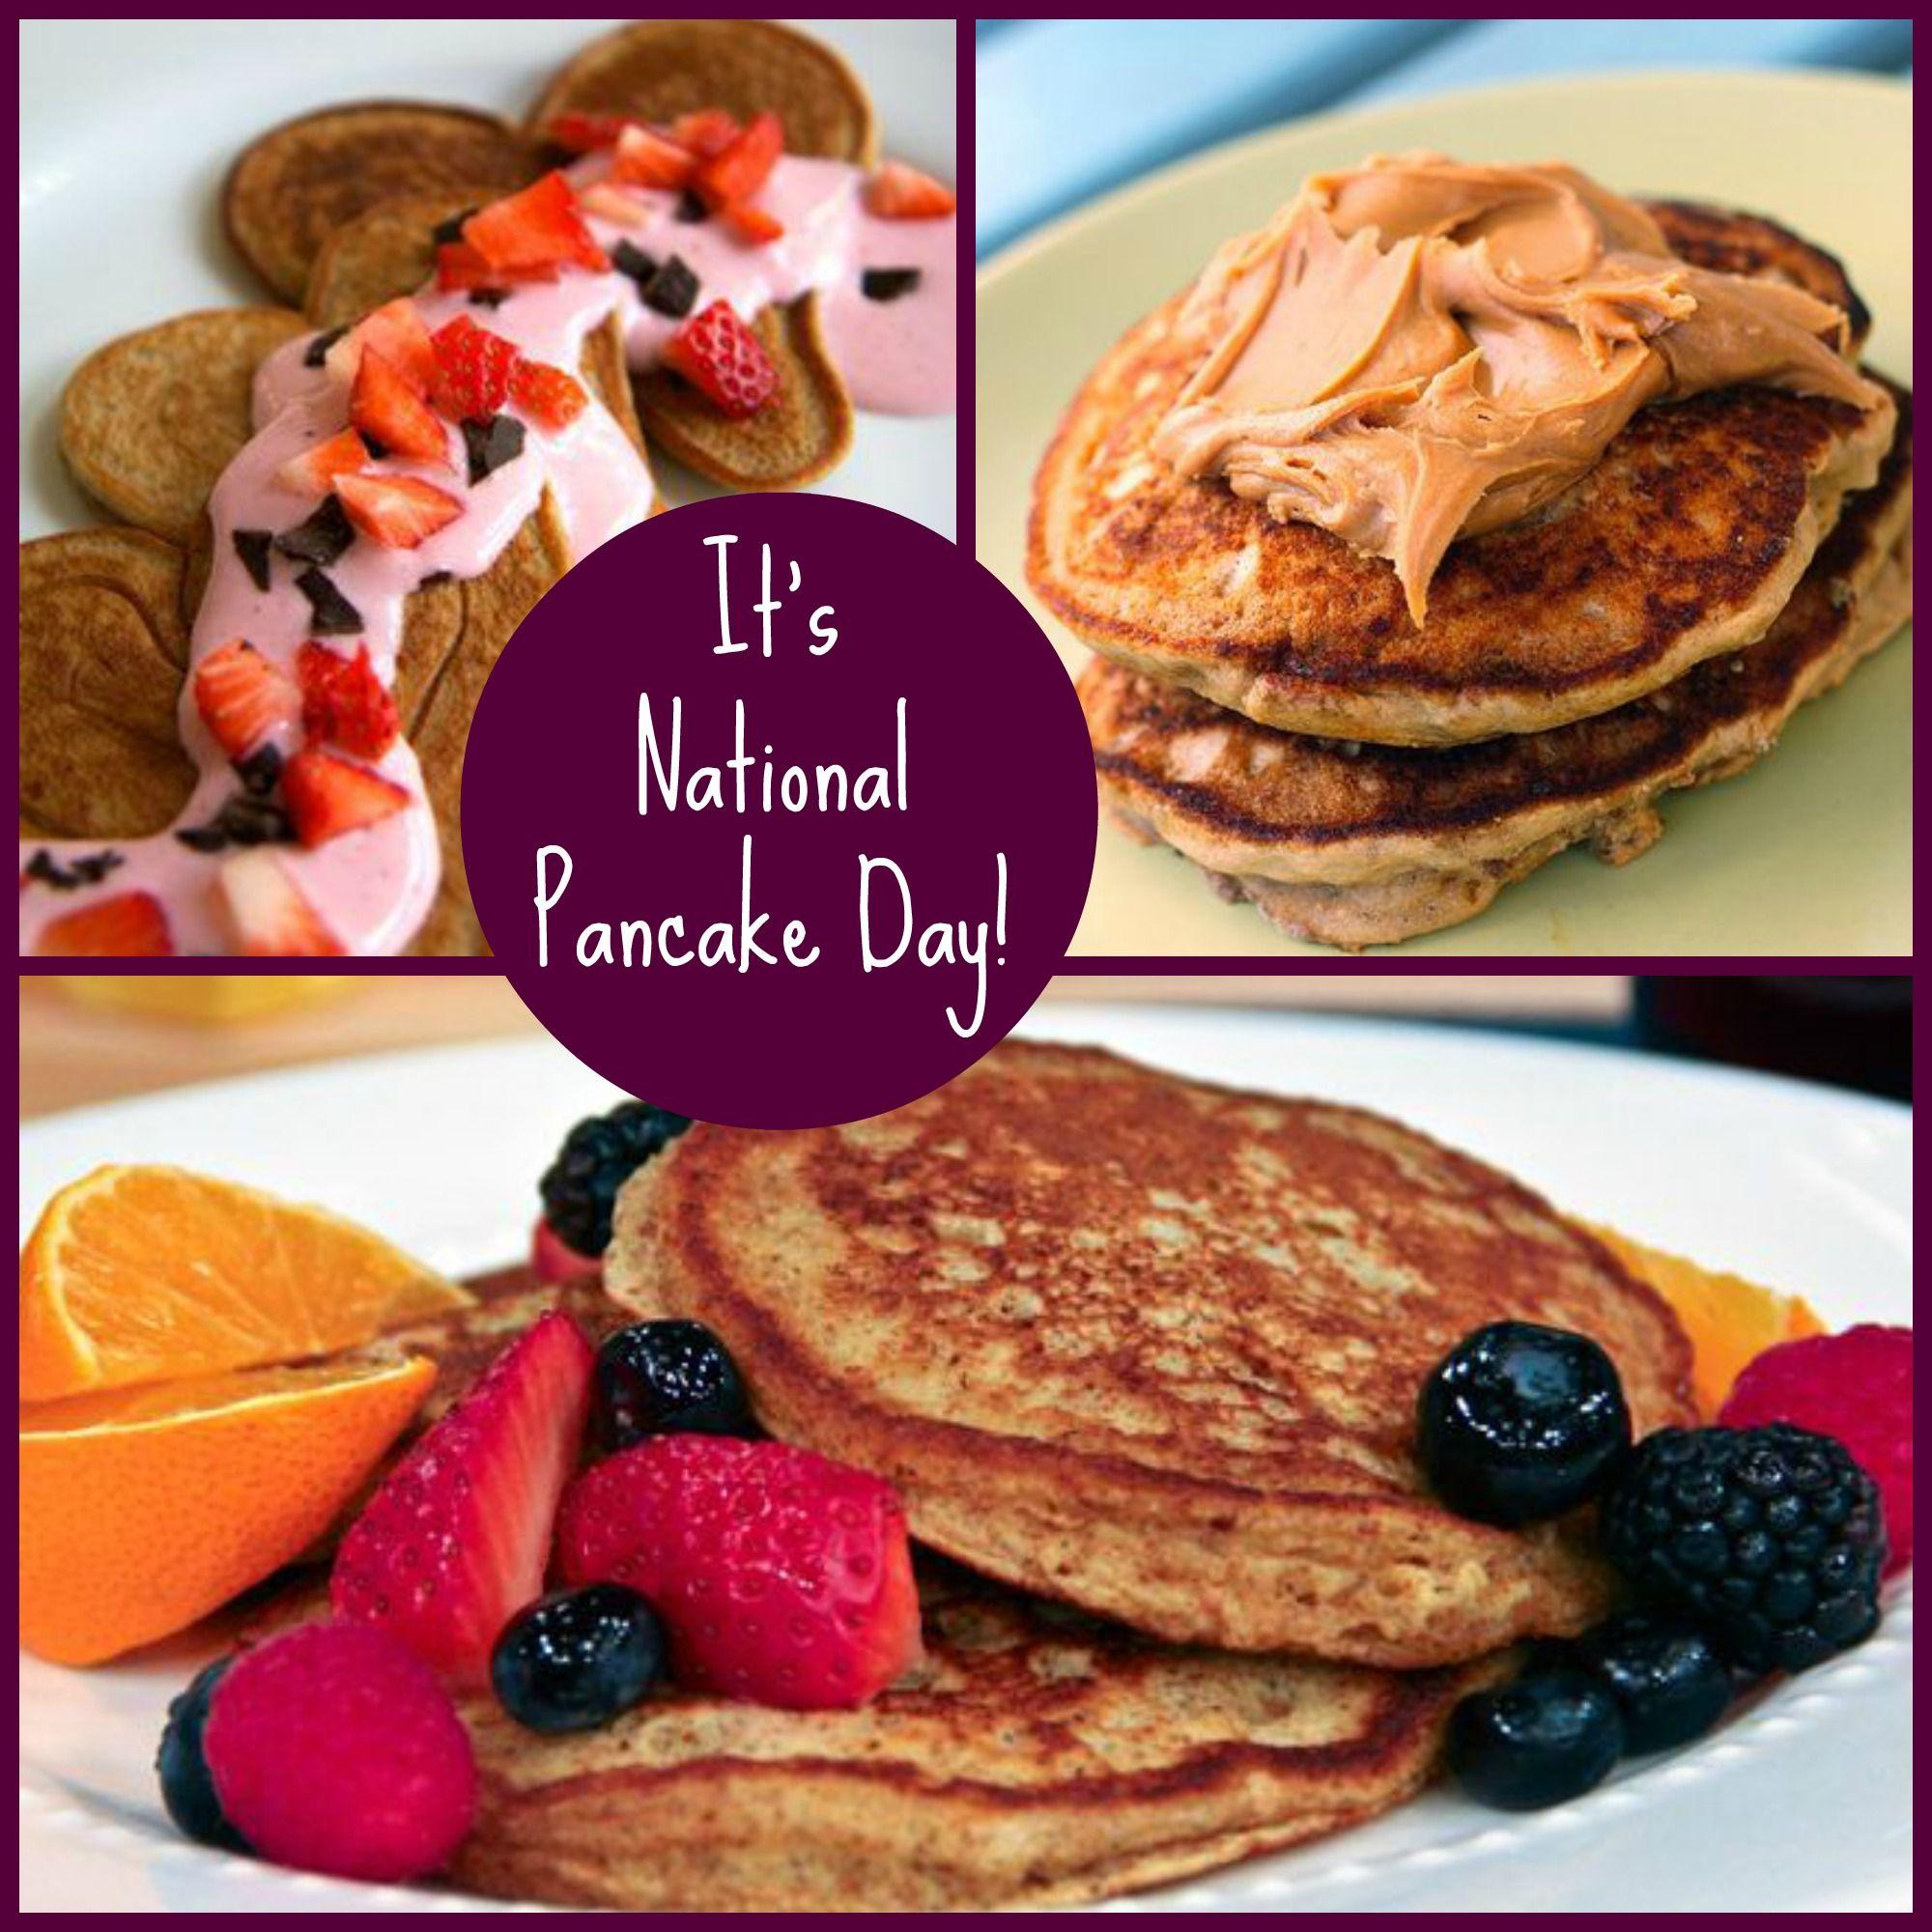 Do you celebrate National Pancake Day?